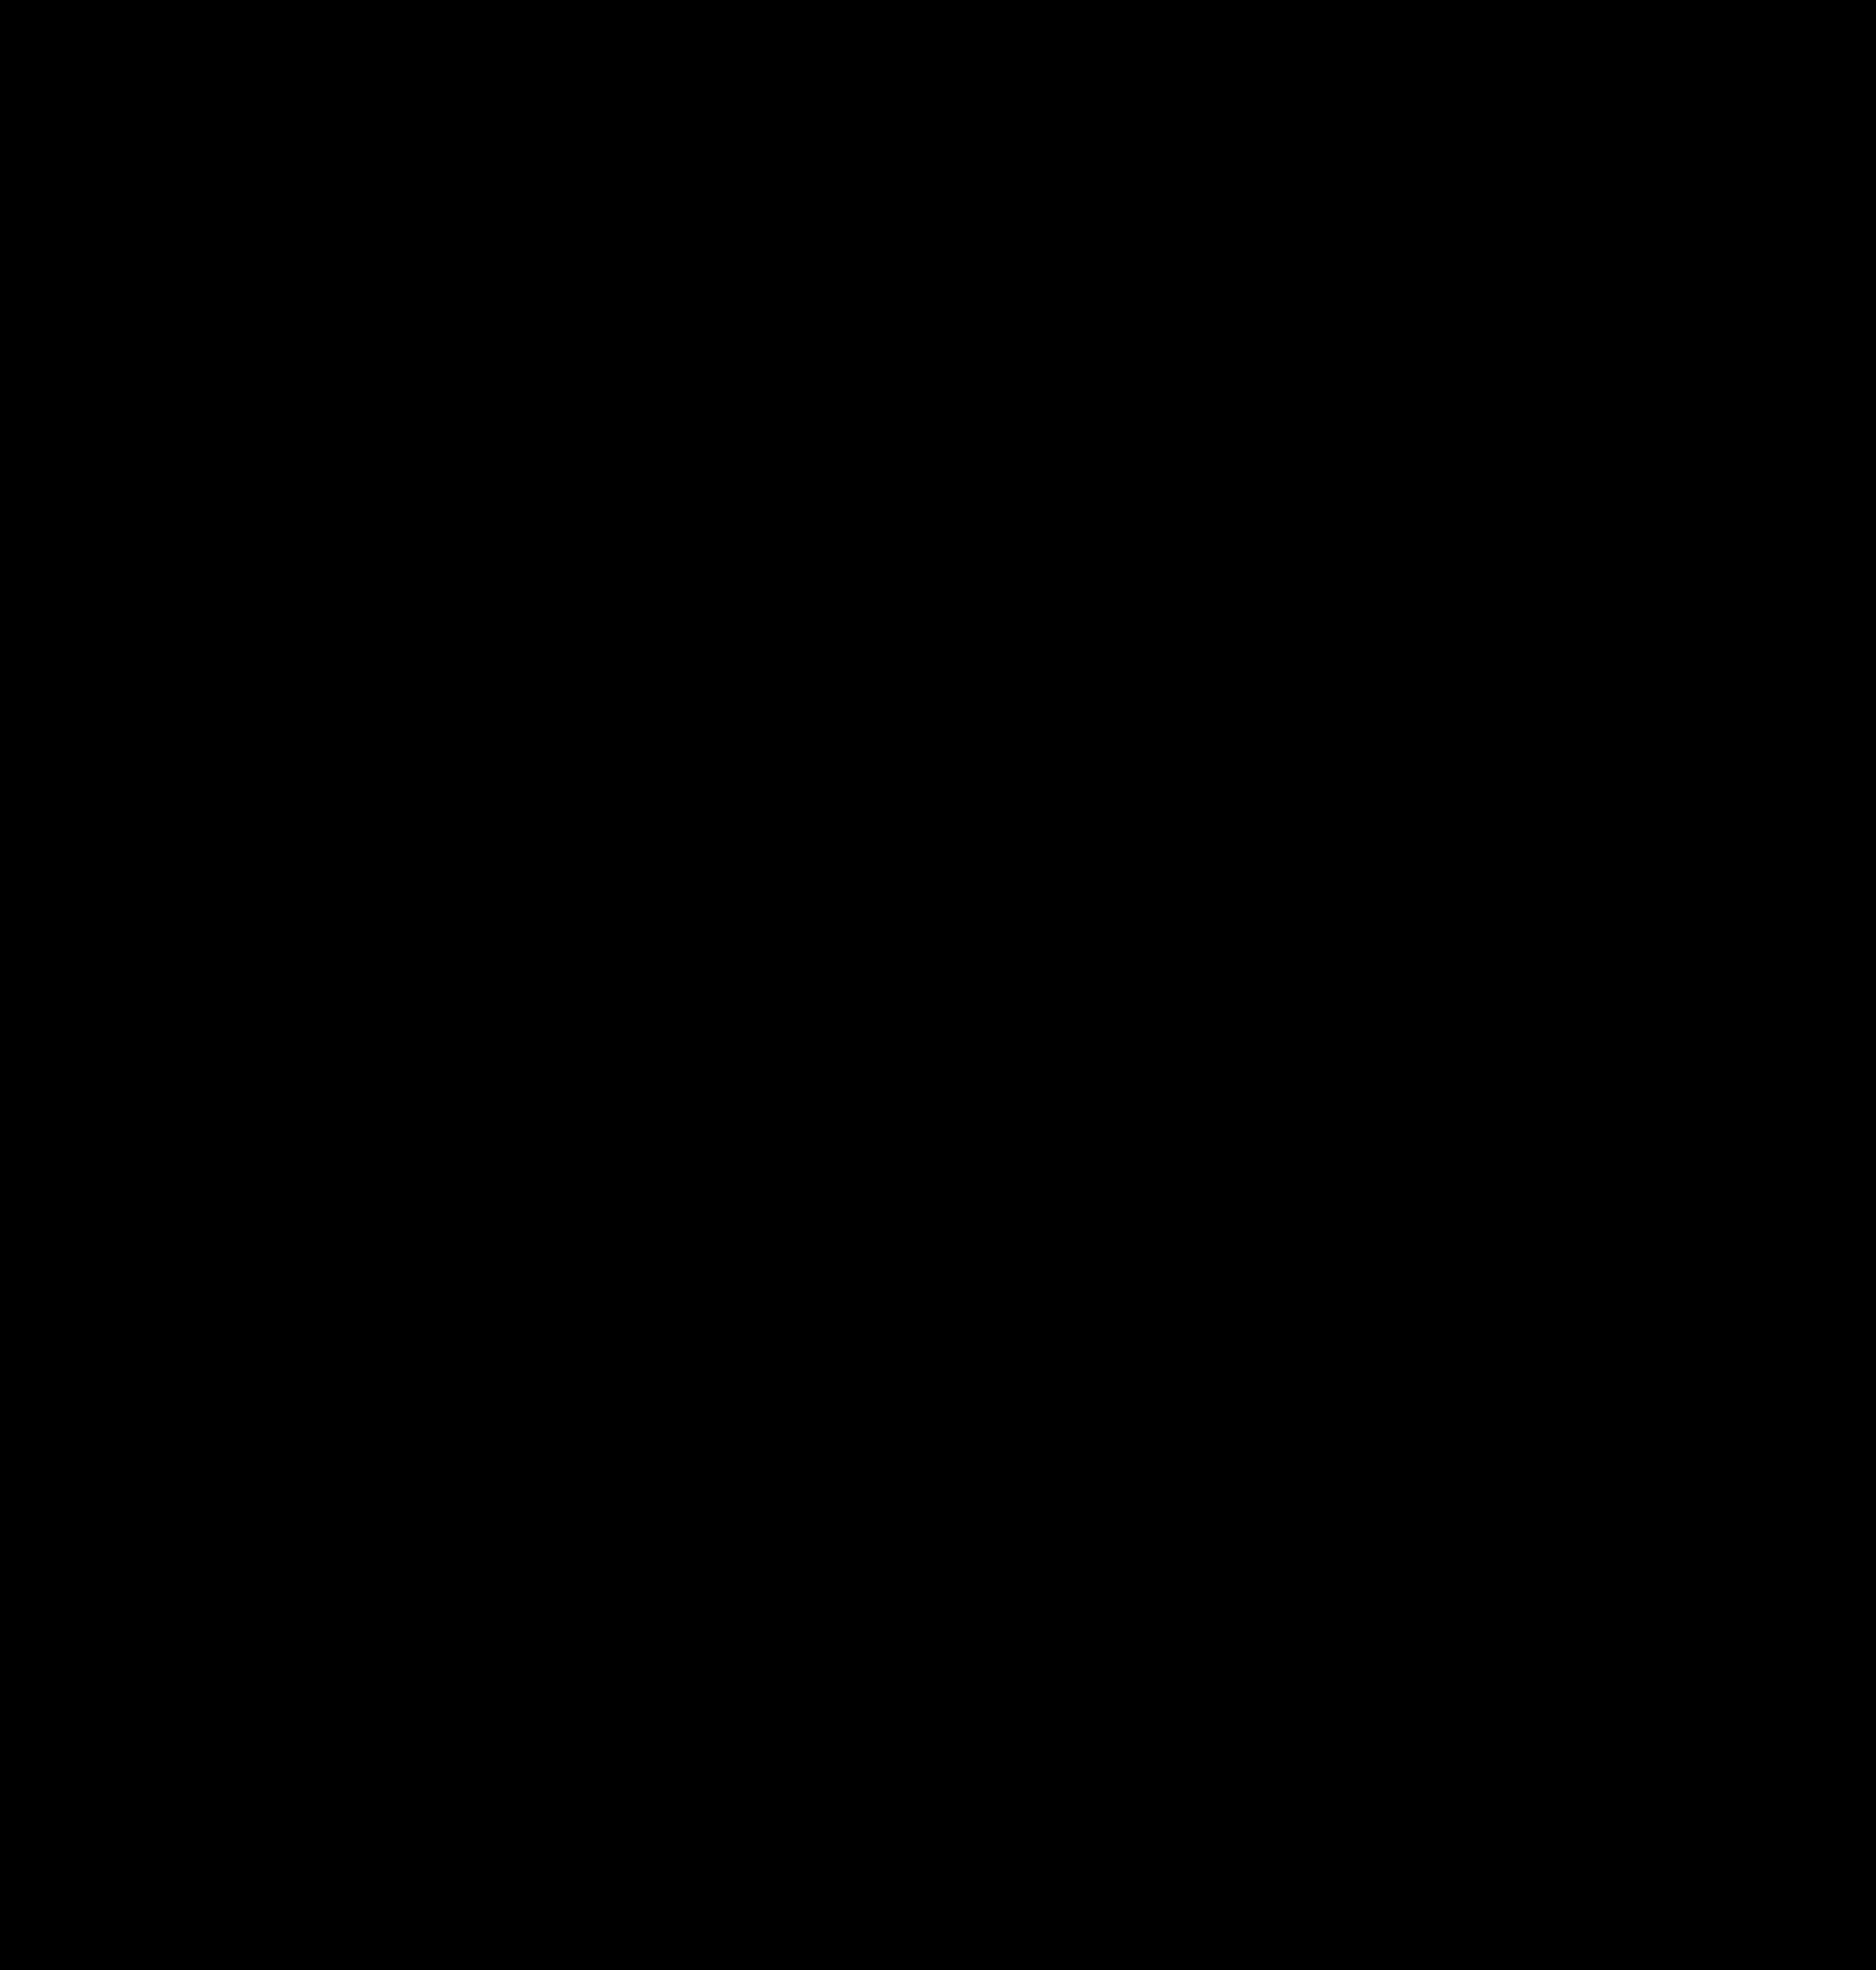 dermot-3